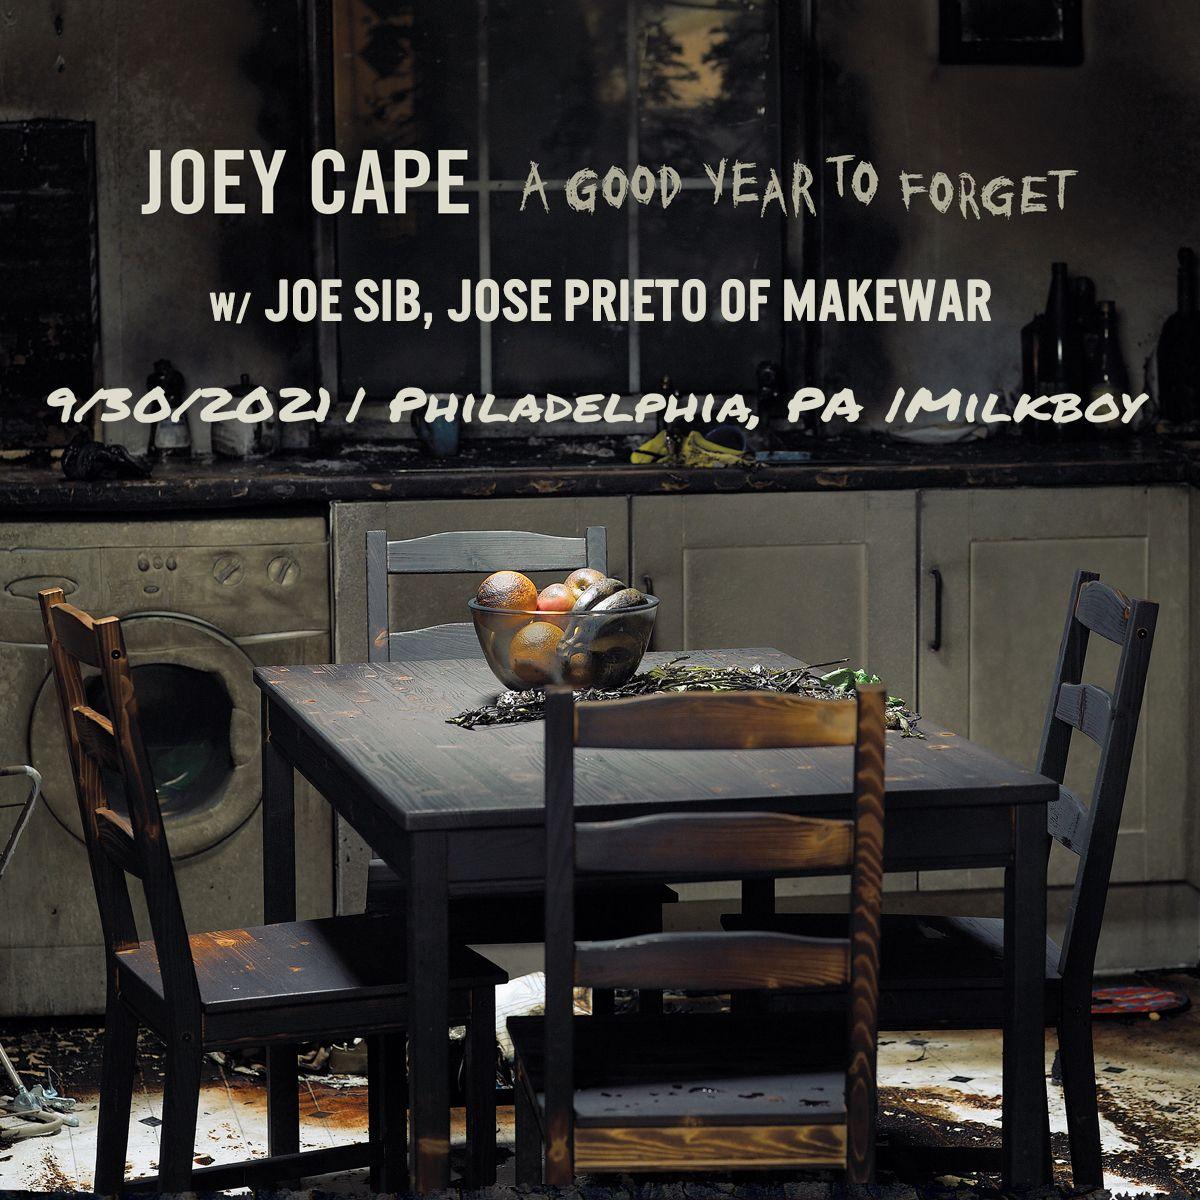 Joey Cape: